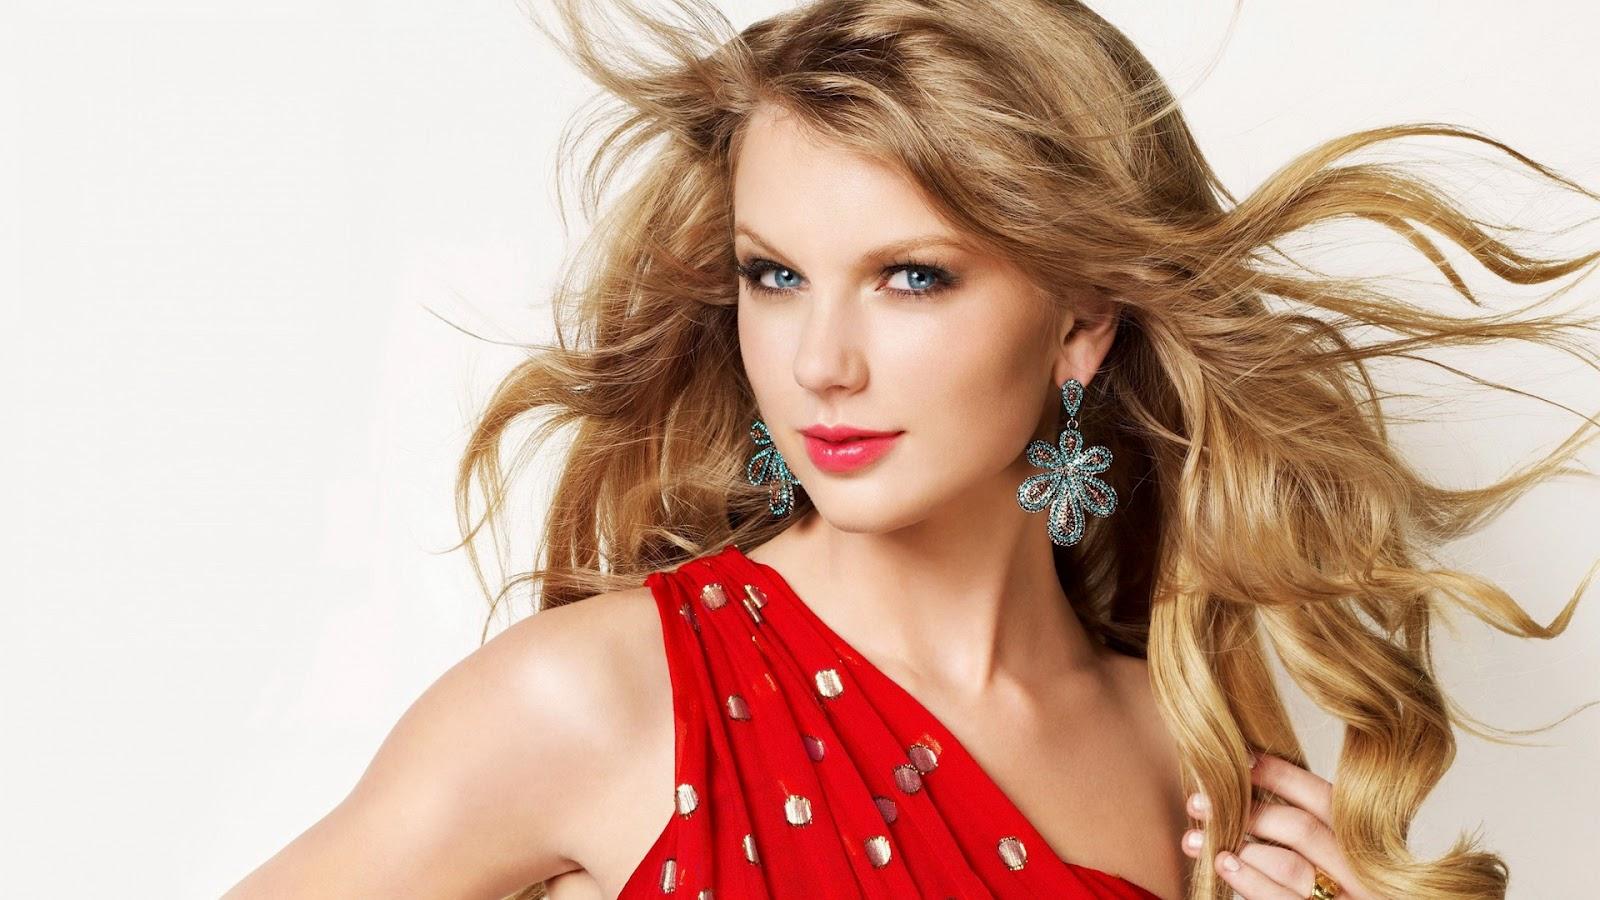 http://4.bp.blogspot.com/-S3qQGYM_T8Y/UFXoA6uF2rI/AAAAAAAACac/FlNTtF5gJis/s1600/Taylor-Swift-HD-desktop-wallpapers.jpg